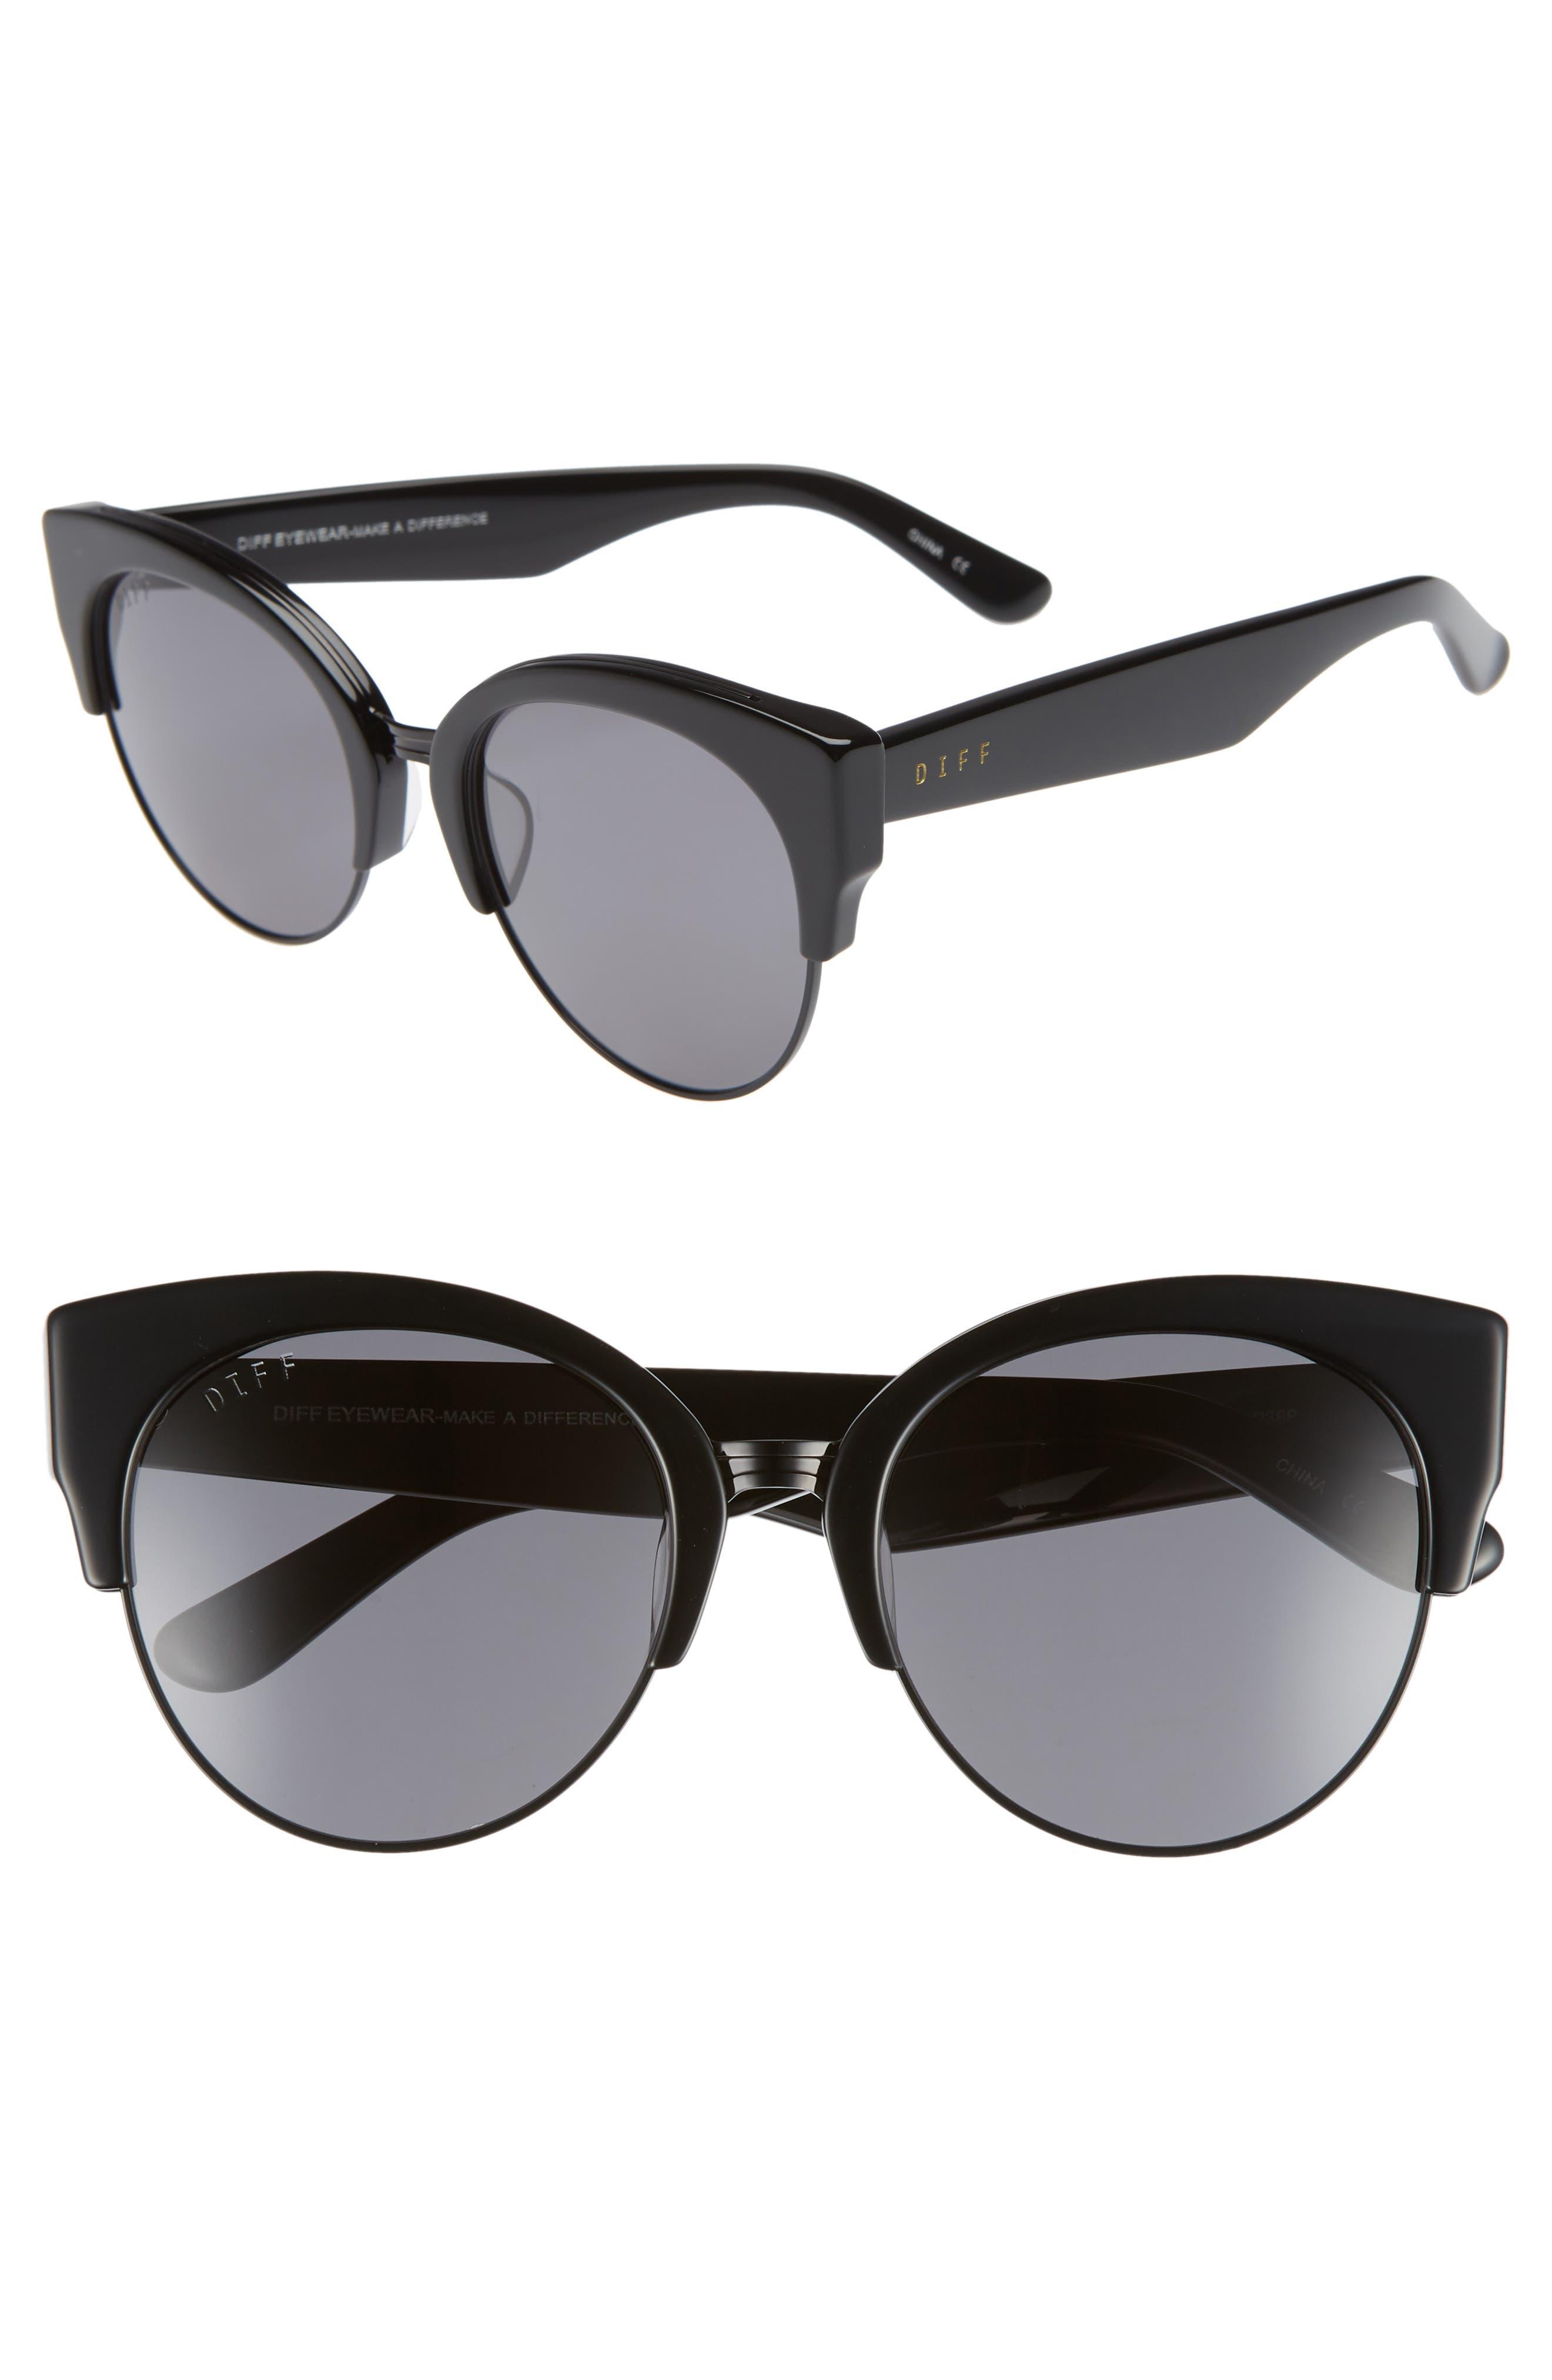 Stella 55mm Polarized Cat Eye Sunglasses,                             Main thumbnail 1, color,                             BLACK/ GREY